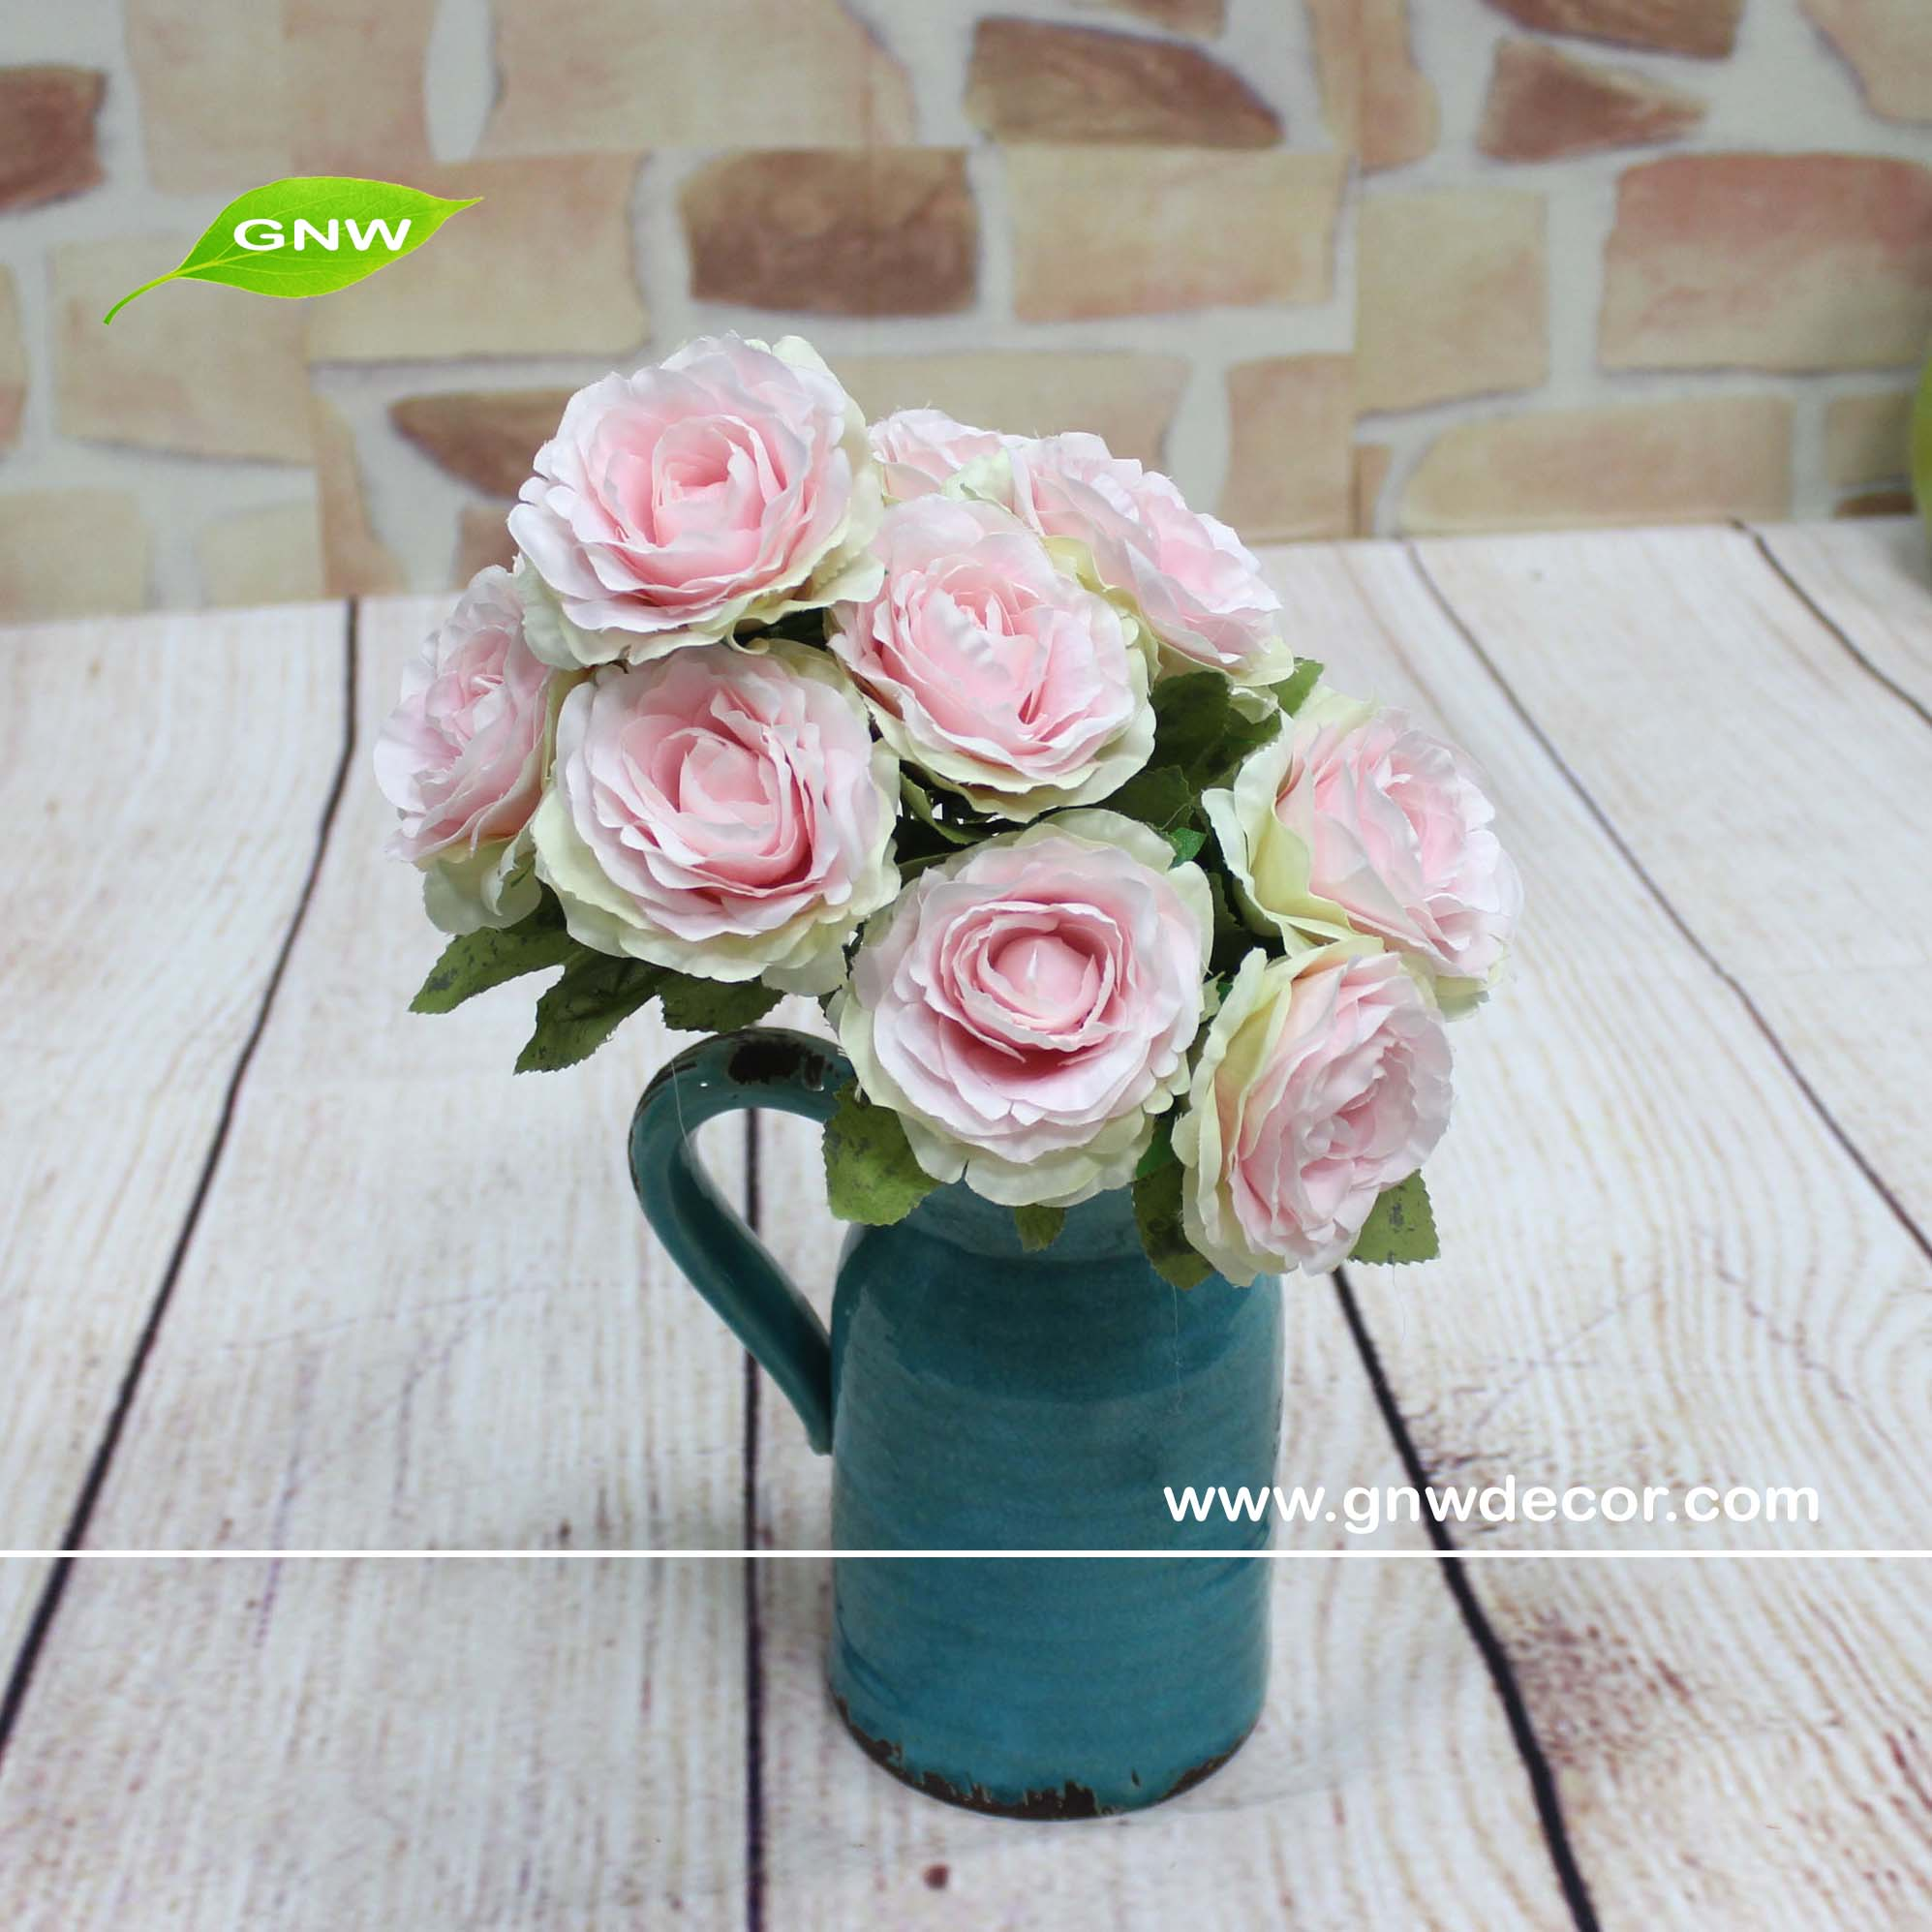 Gnw Artificial Silk Flowers Factory Flowers On Sale Buy Flowers On